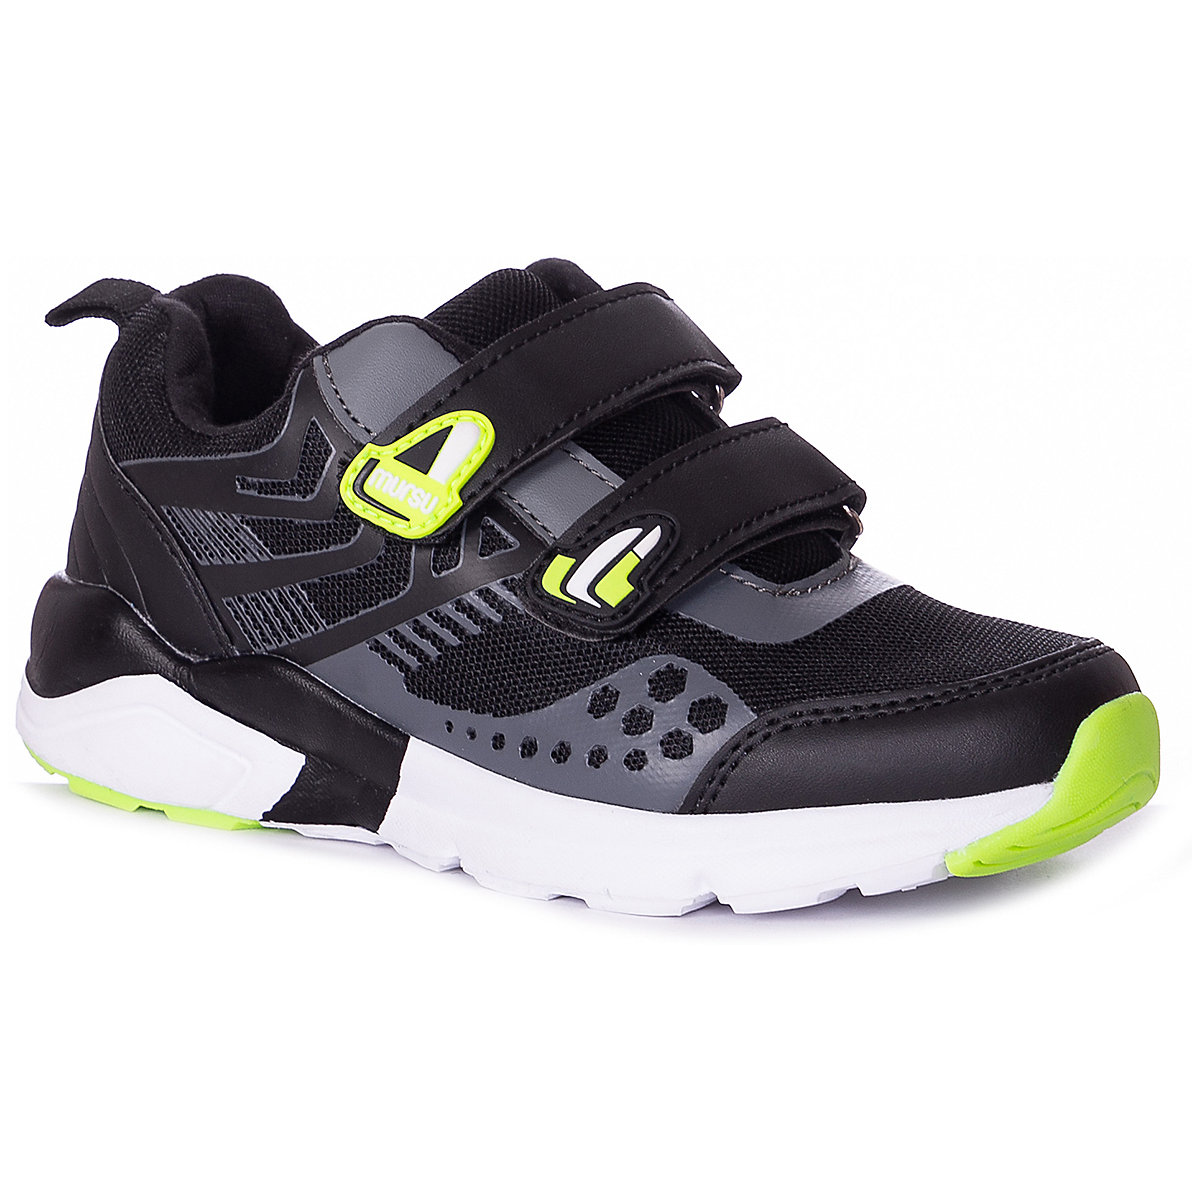 Фото - MURSU Kids' Sneakers 10612023 children's sports running shoes Spring Autumn Boys Boy 2017 men s autumn running sports suit